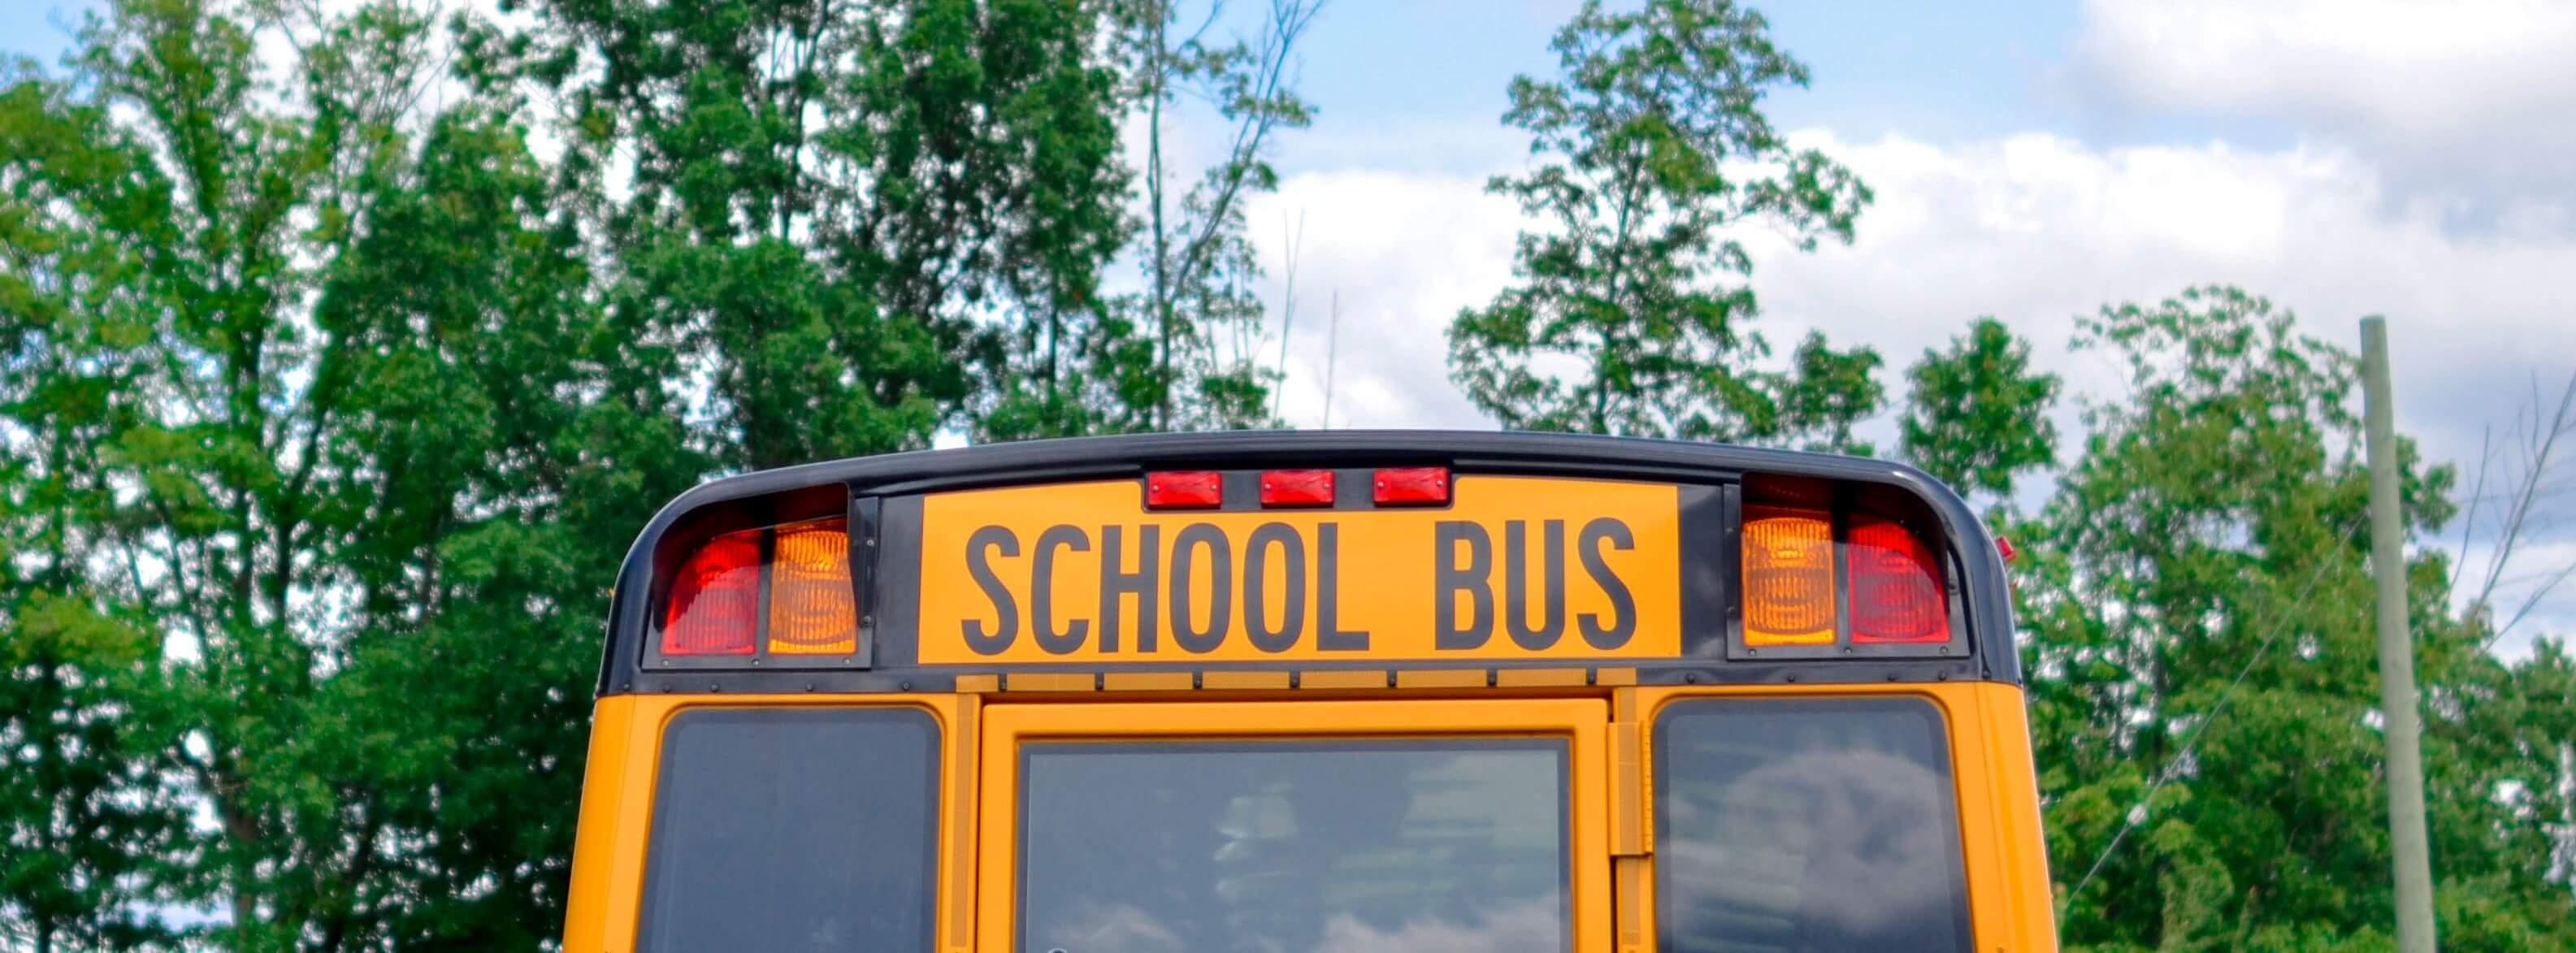 school bus banner - element5-digital-7K_agbqPqYo-unsplash